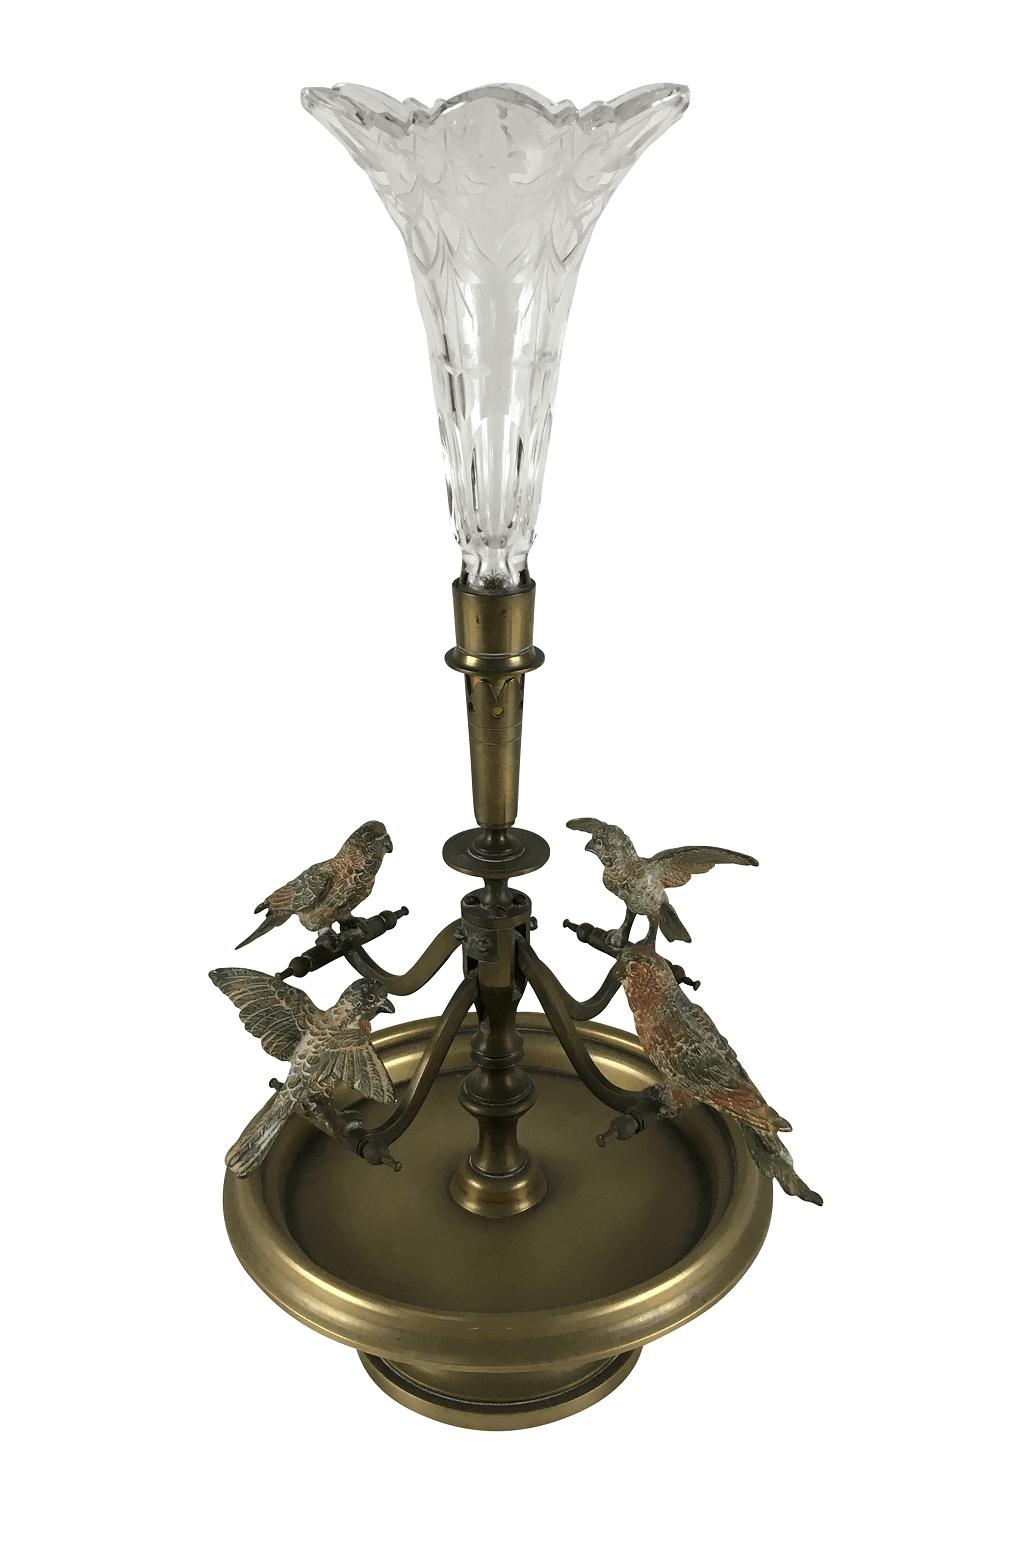 Linda Escultura Antiga Decorativa Em Bronze E Cristal